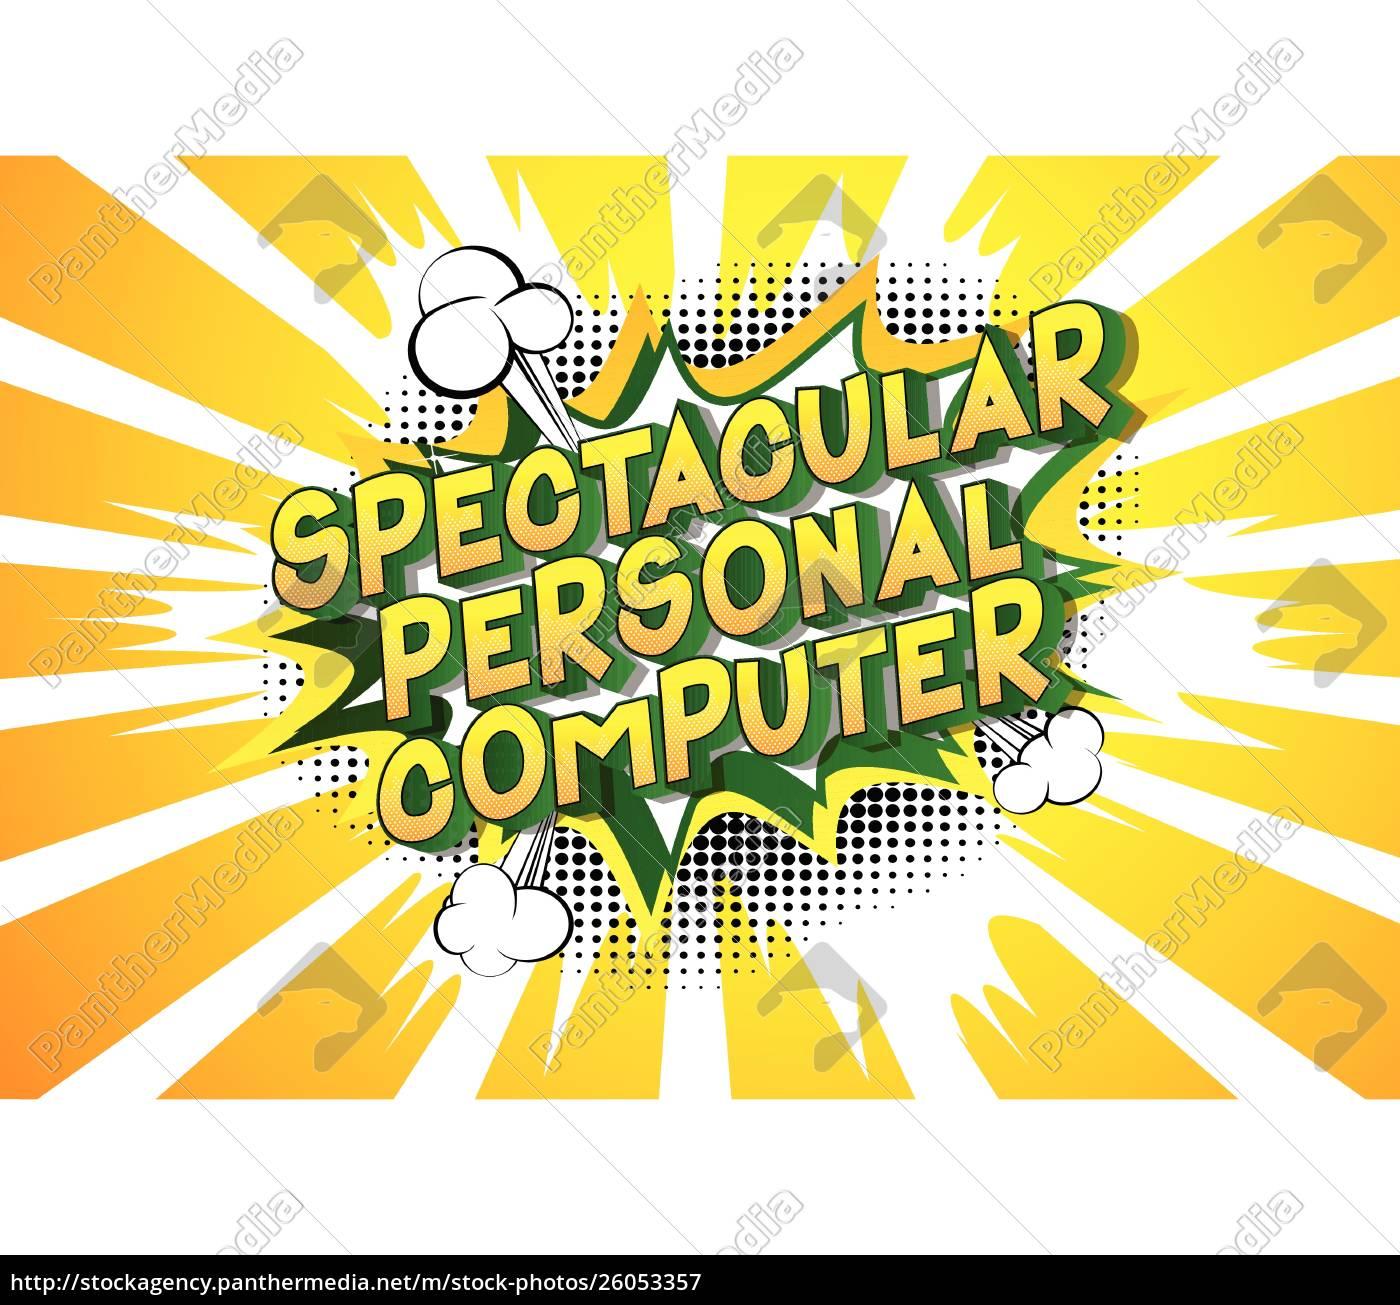 spectacular, personal, computer, -, comic, book - 26053357